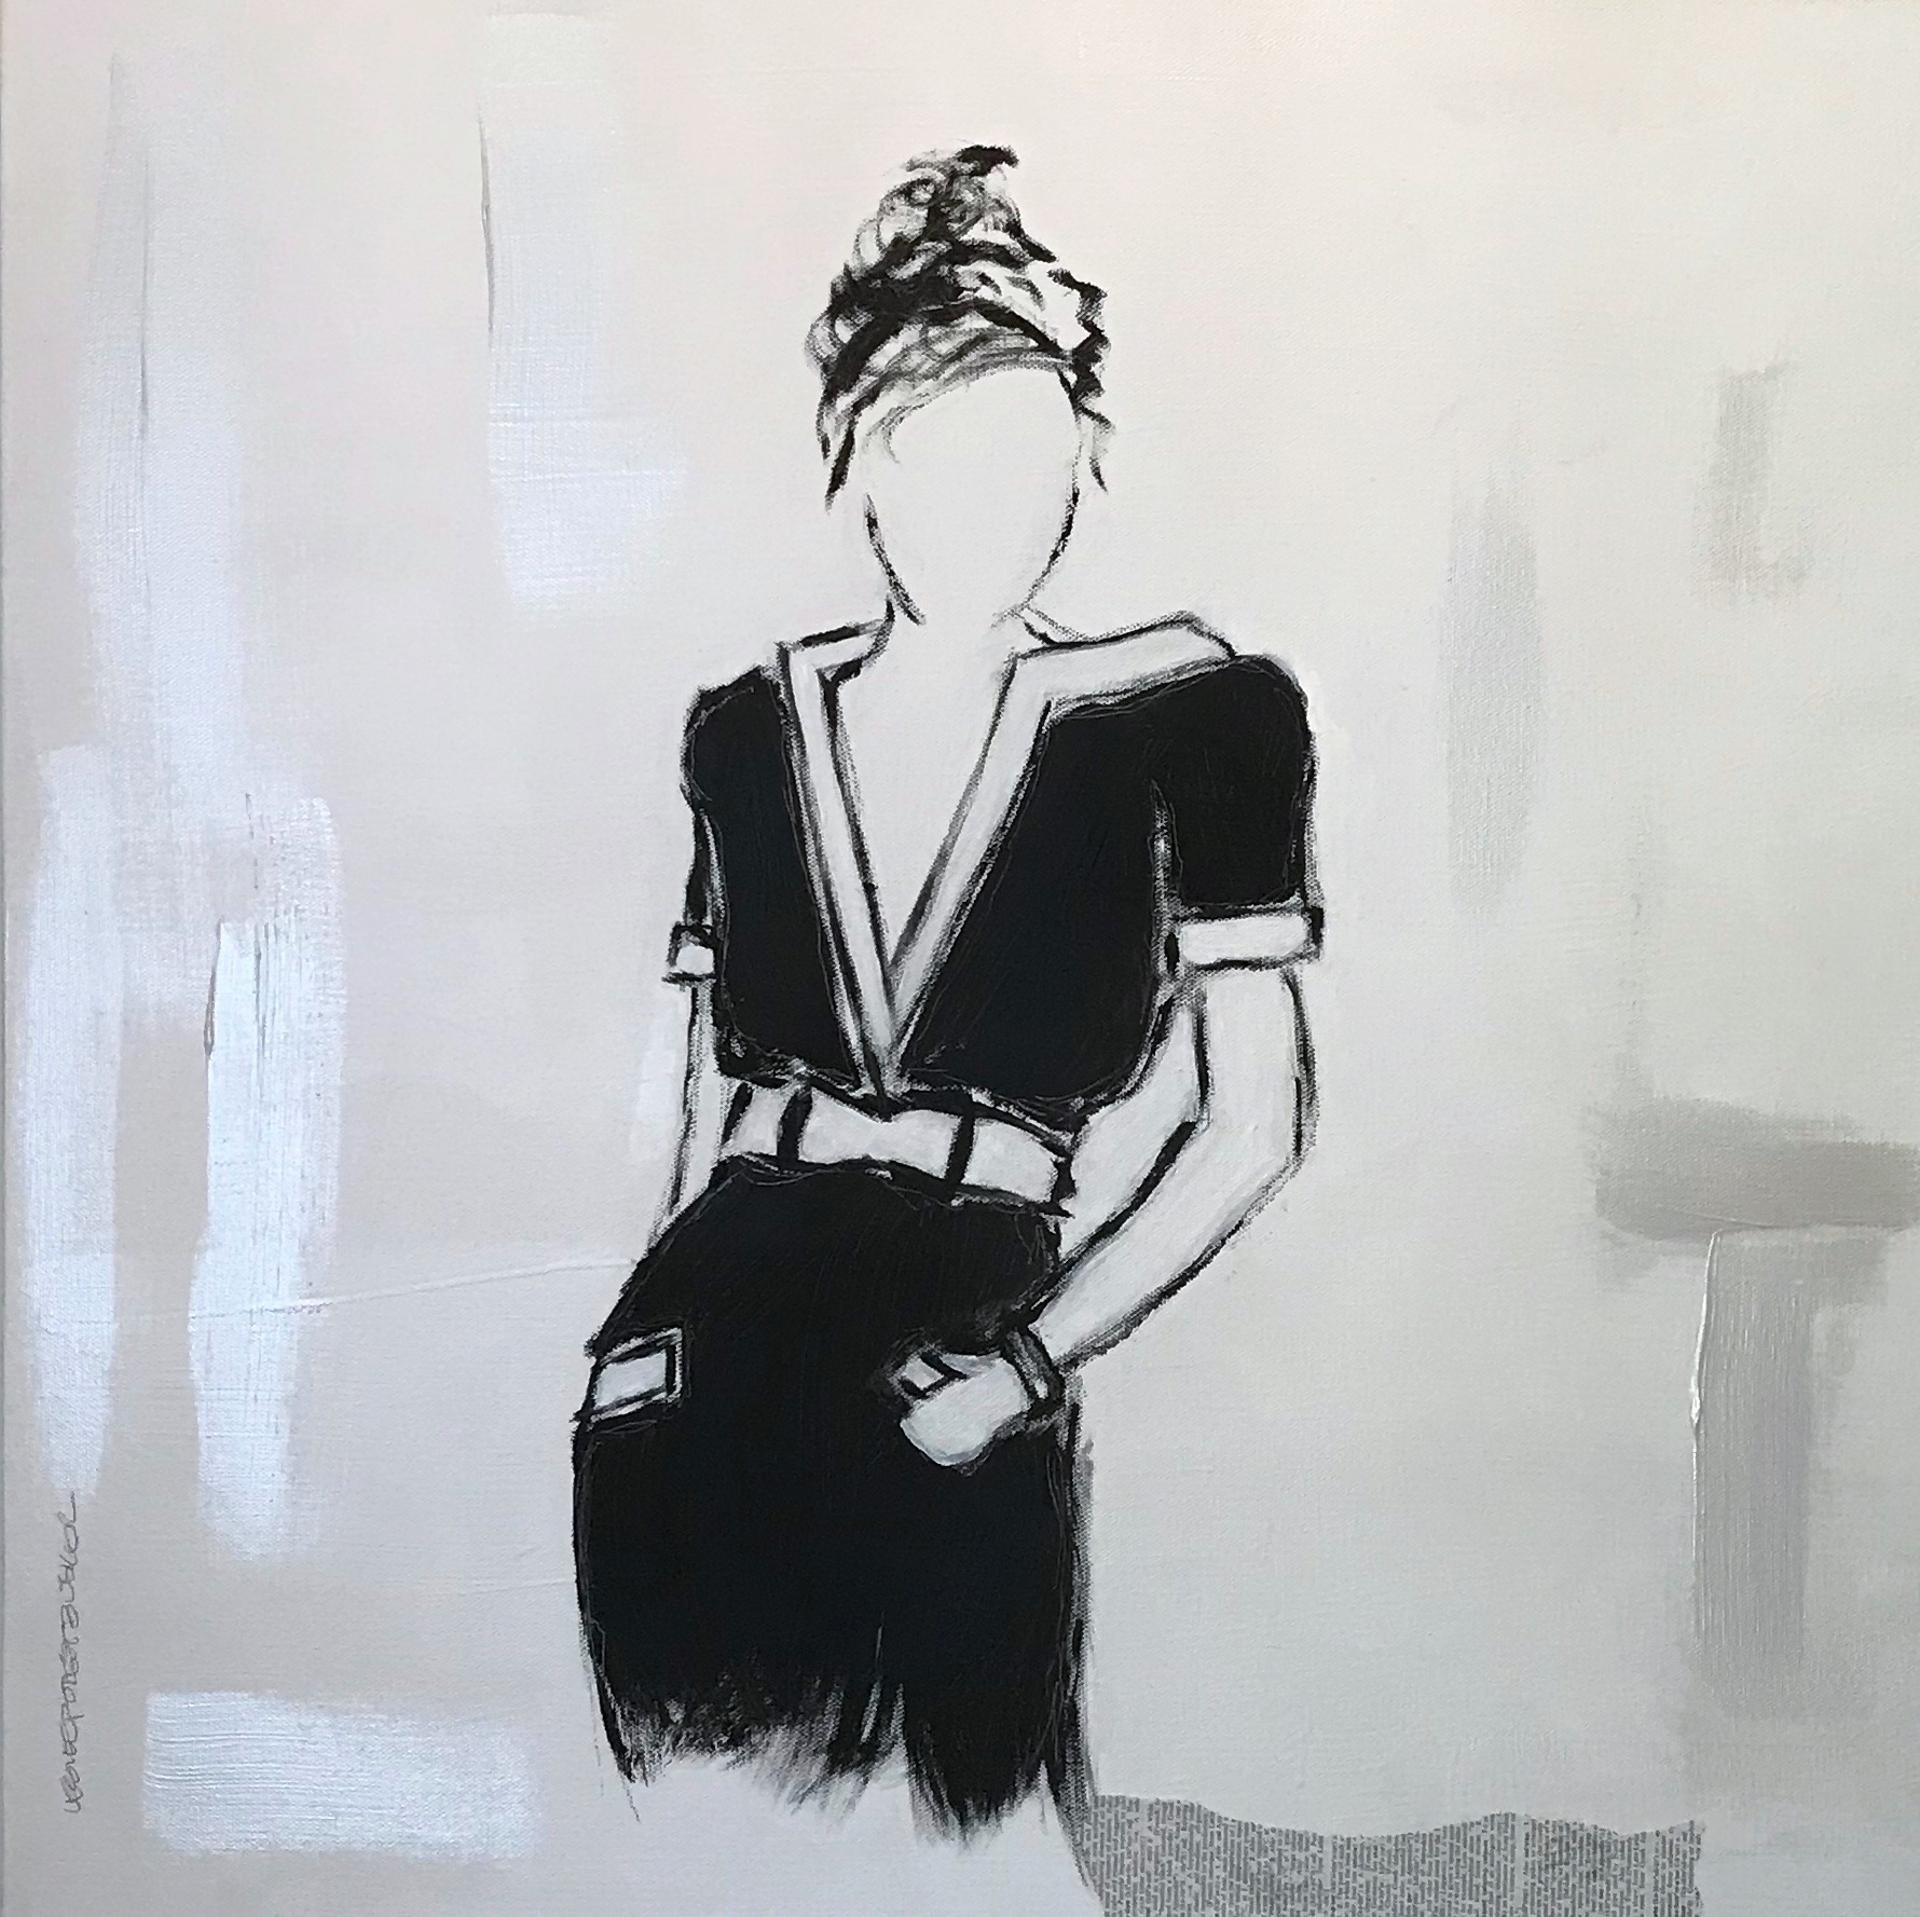 Figure No. 128 by Leslie Poteet Busker